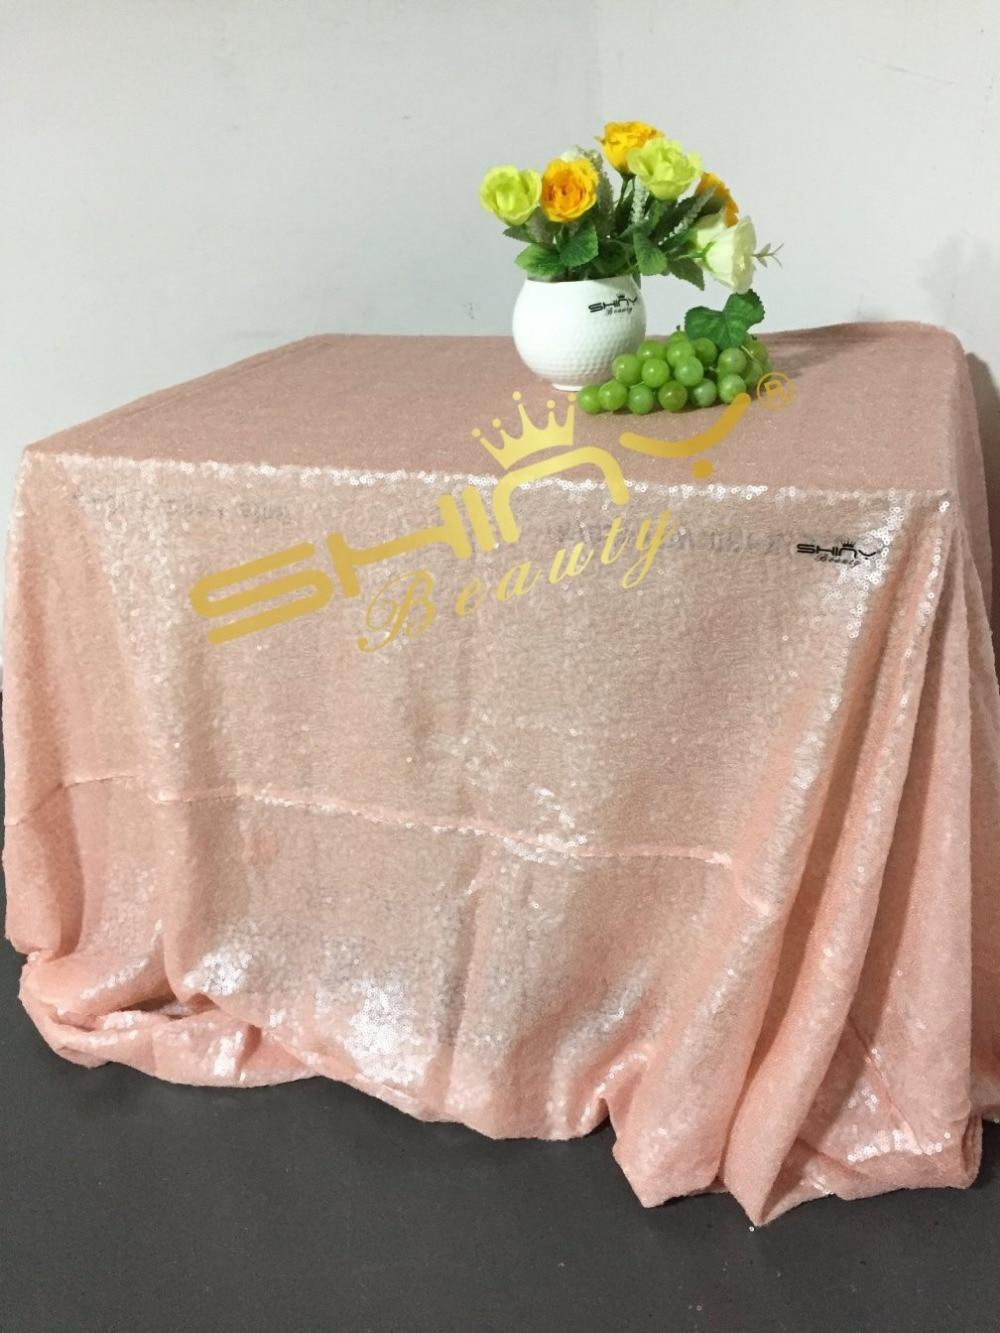 Румяна розовый 90x132 дюймов блесток скатерть, 8x9ft блесток фон, 12x108 блесток Настольная дорожка Комбинации для продажи